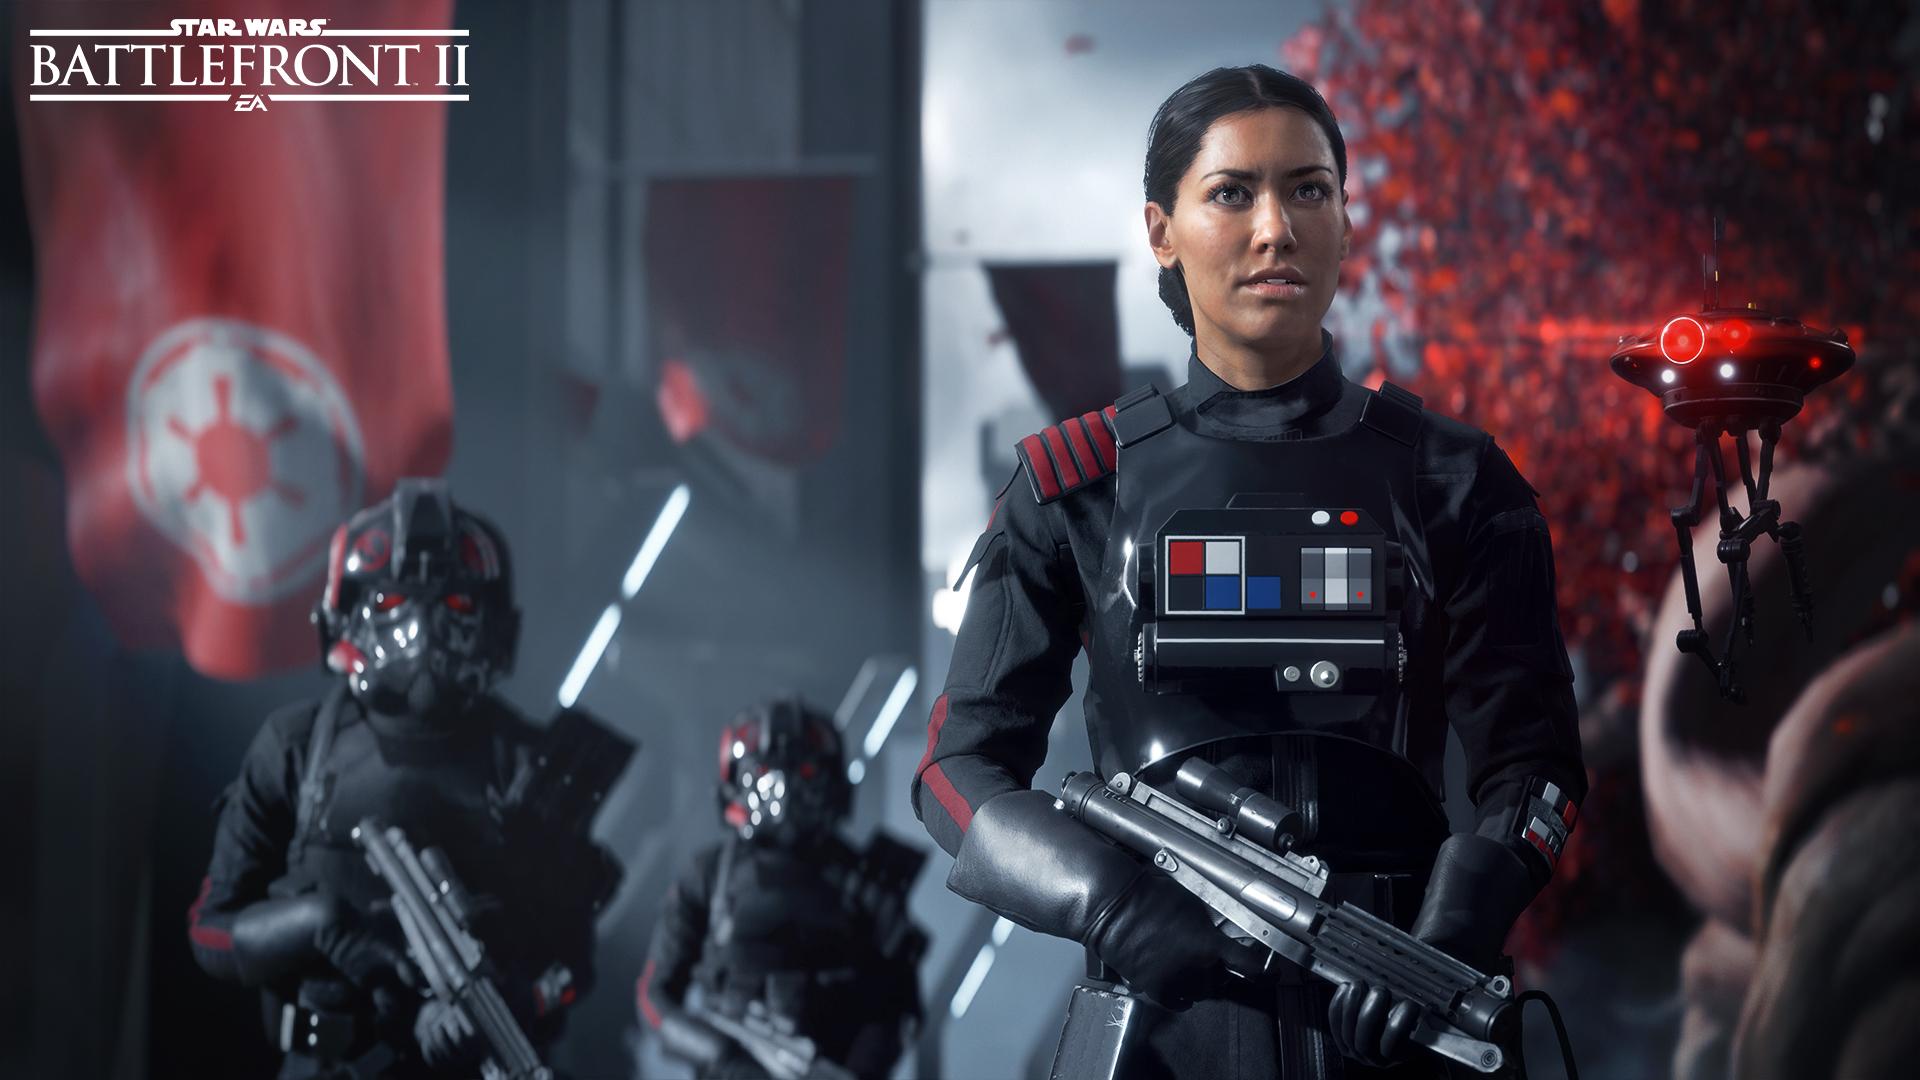 Star Wars: Battlefront II محبوبترین عنوان مراسم E3 سال ۲۰۱۷